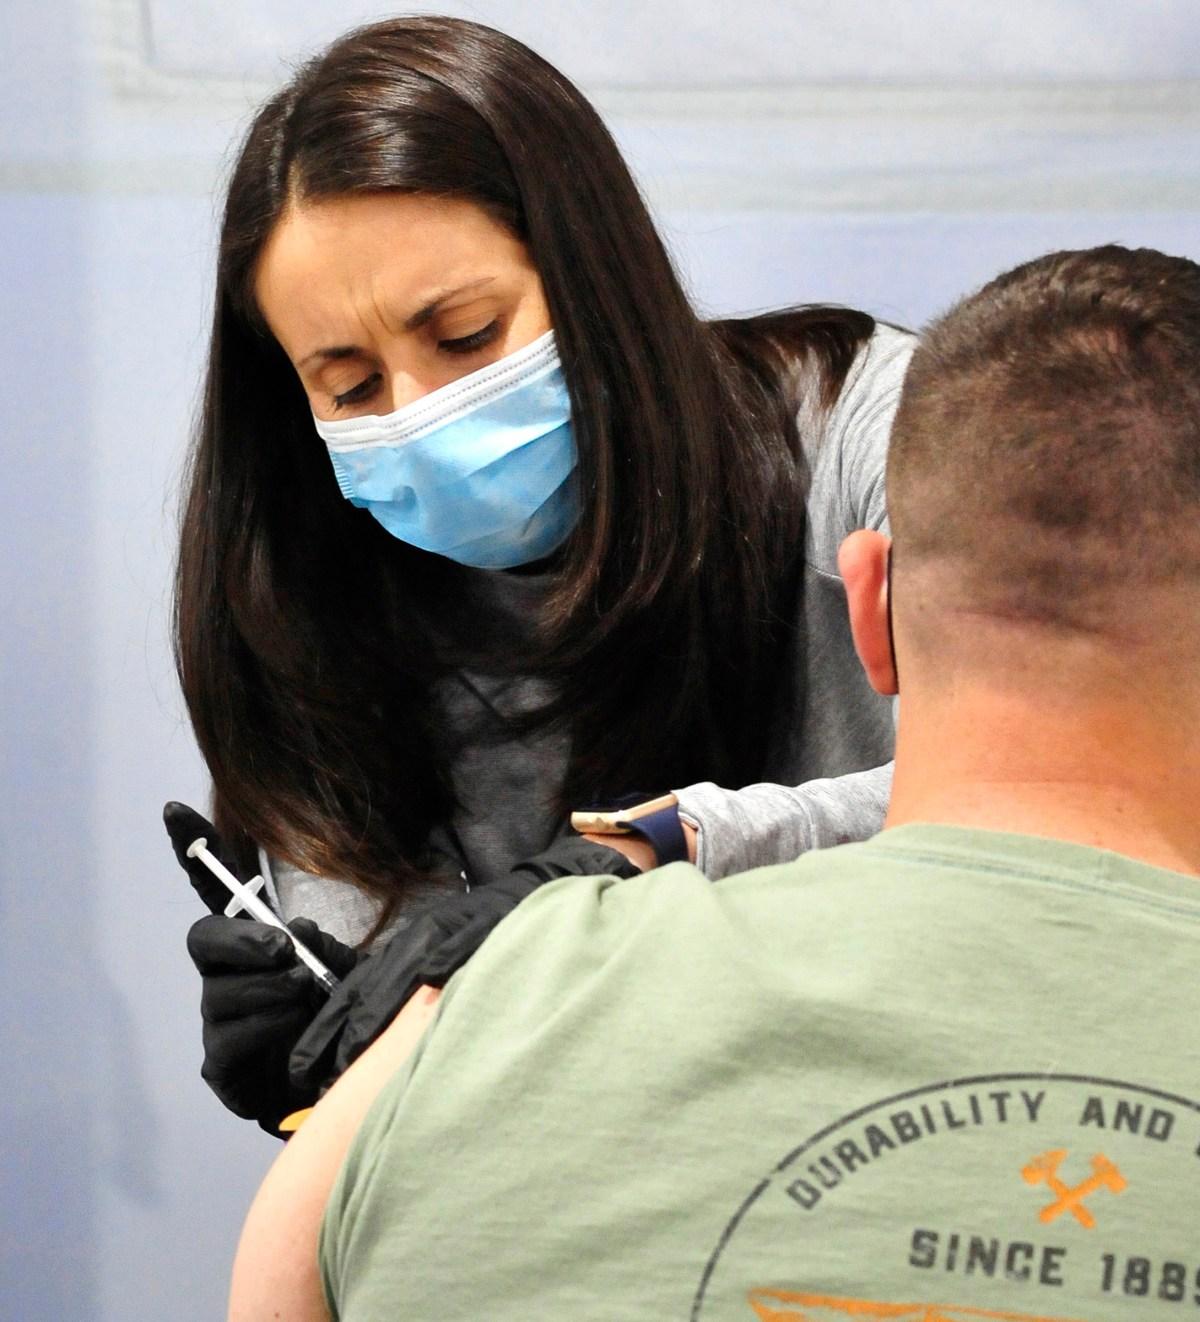 Jessica Sorelle vaccinates a patient.